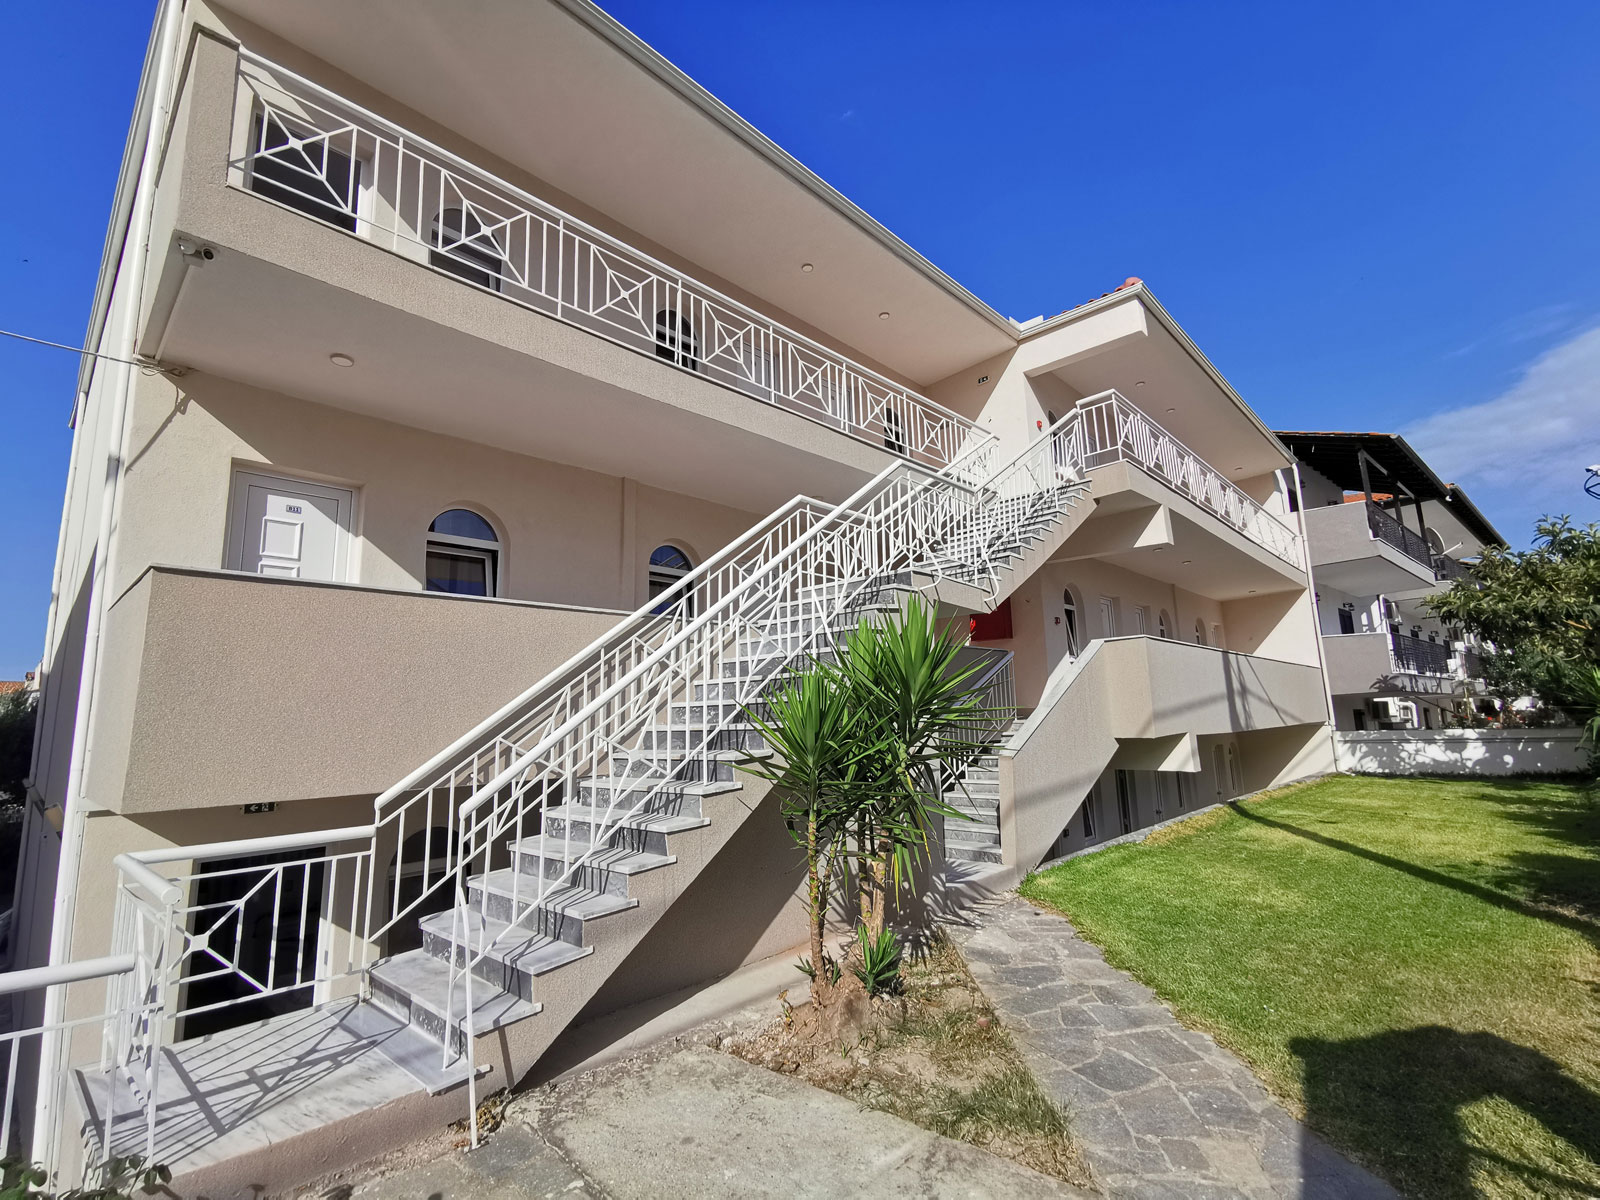 Grcka apartmani letovanje, Polihrono Halkidiki, Green Gardens, kuća B, dvorište prema ulici